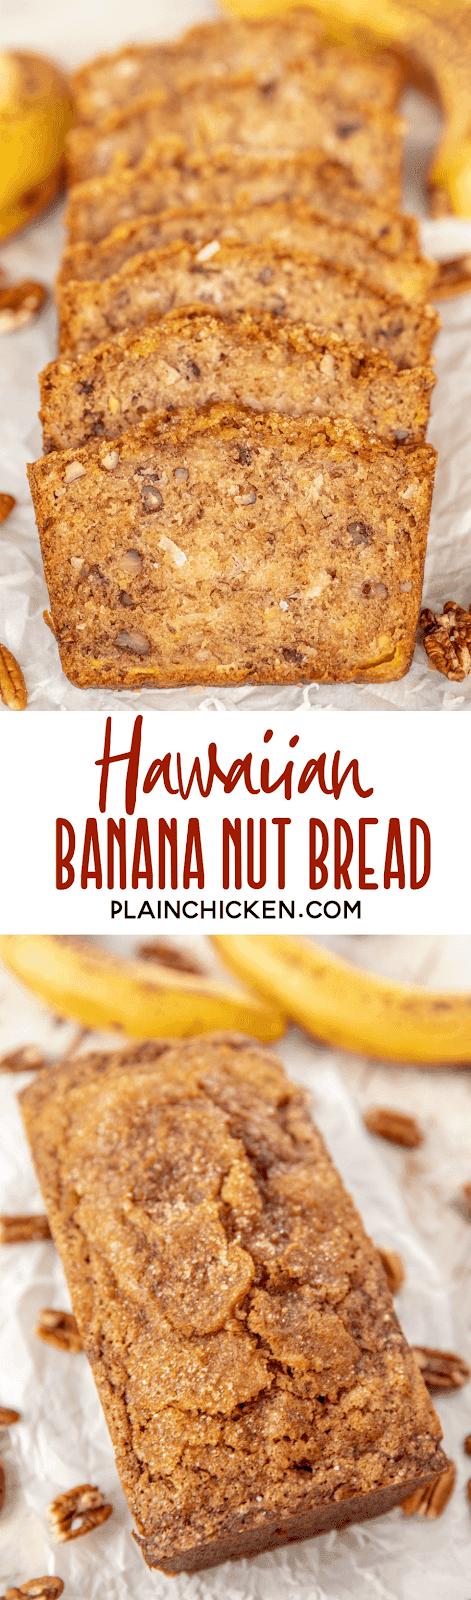 Hawaiian Banana Nut Bread Plain Chicken